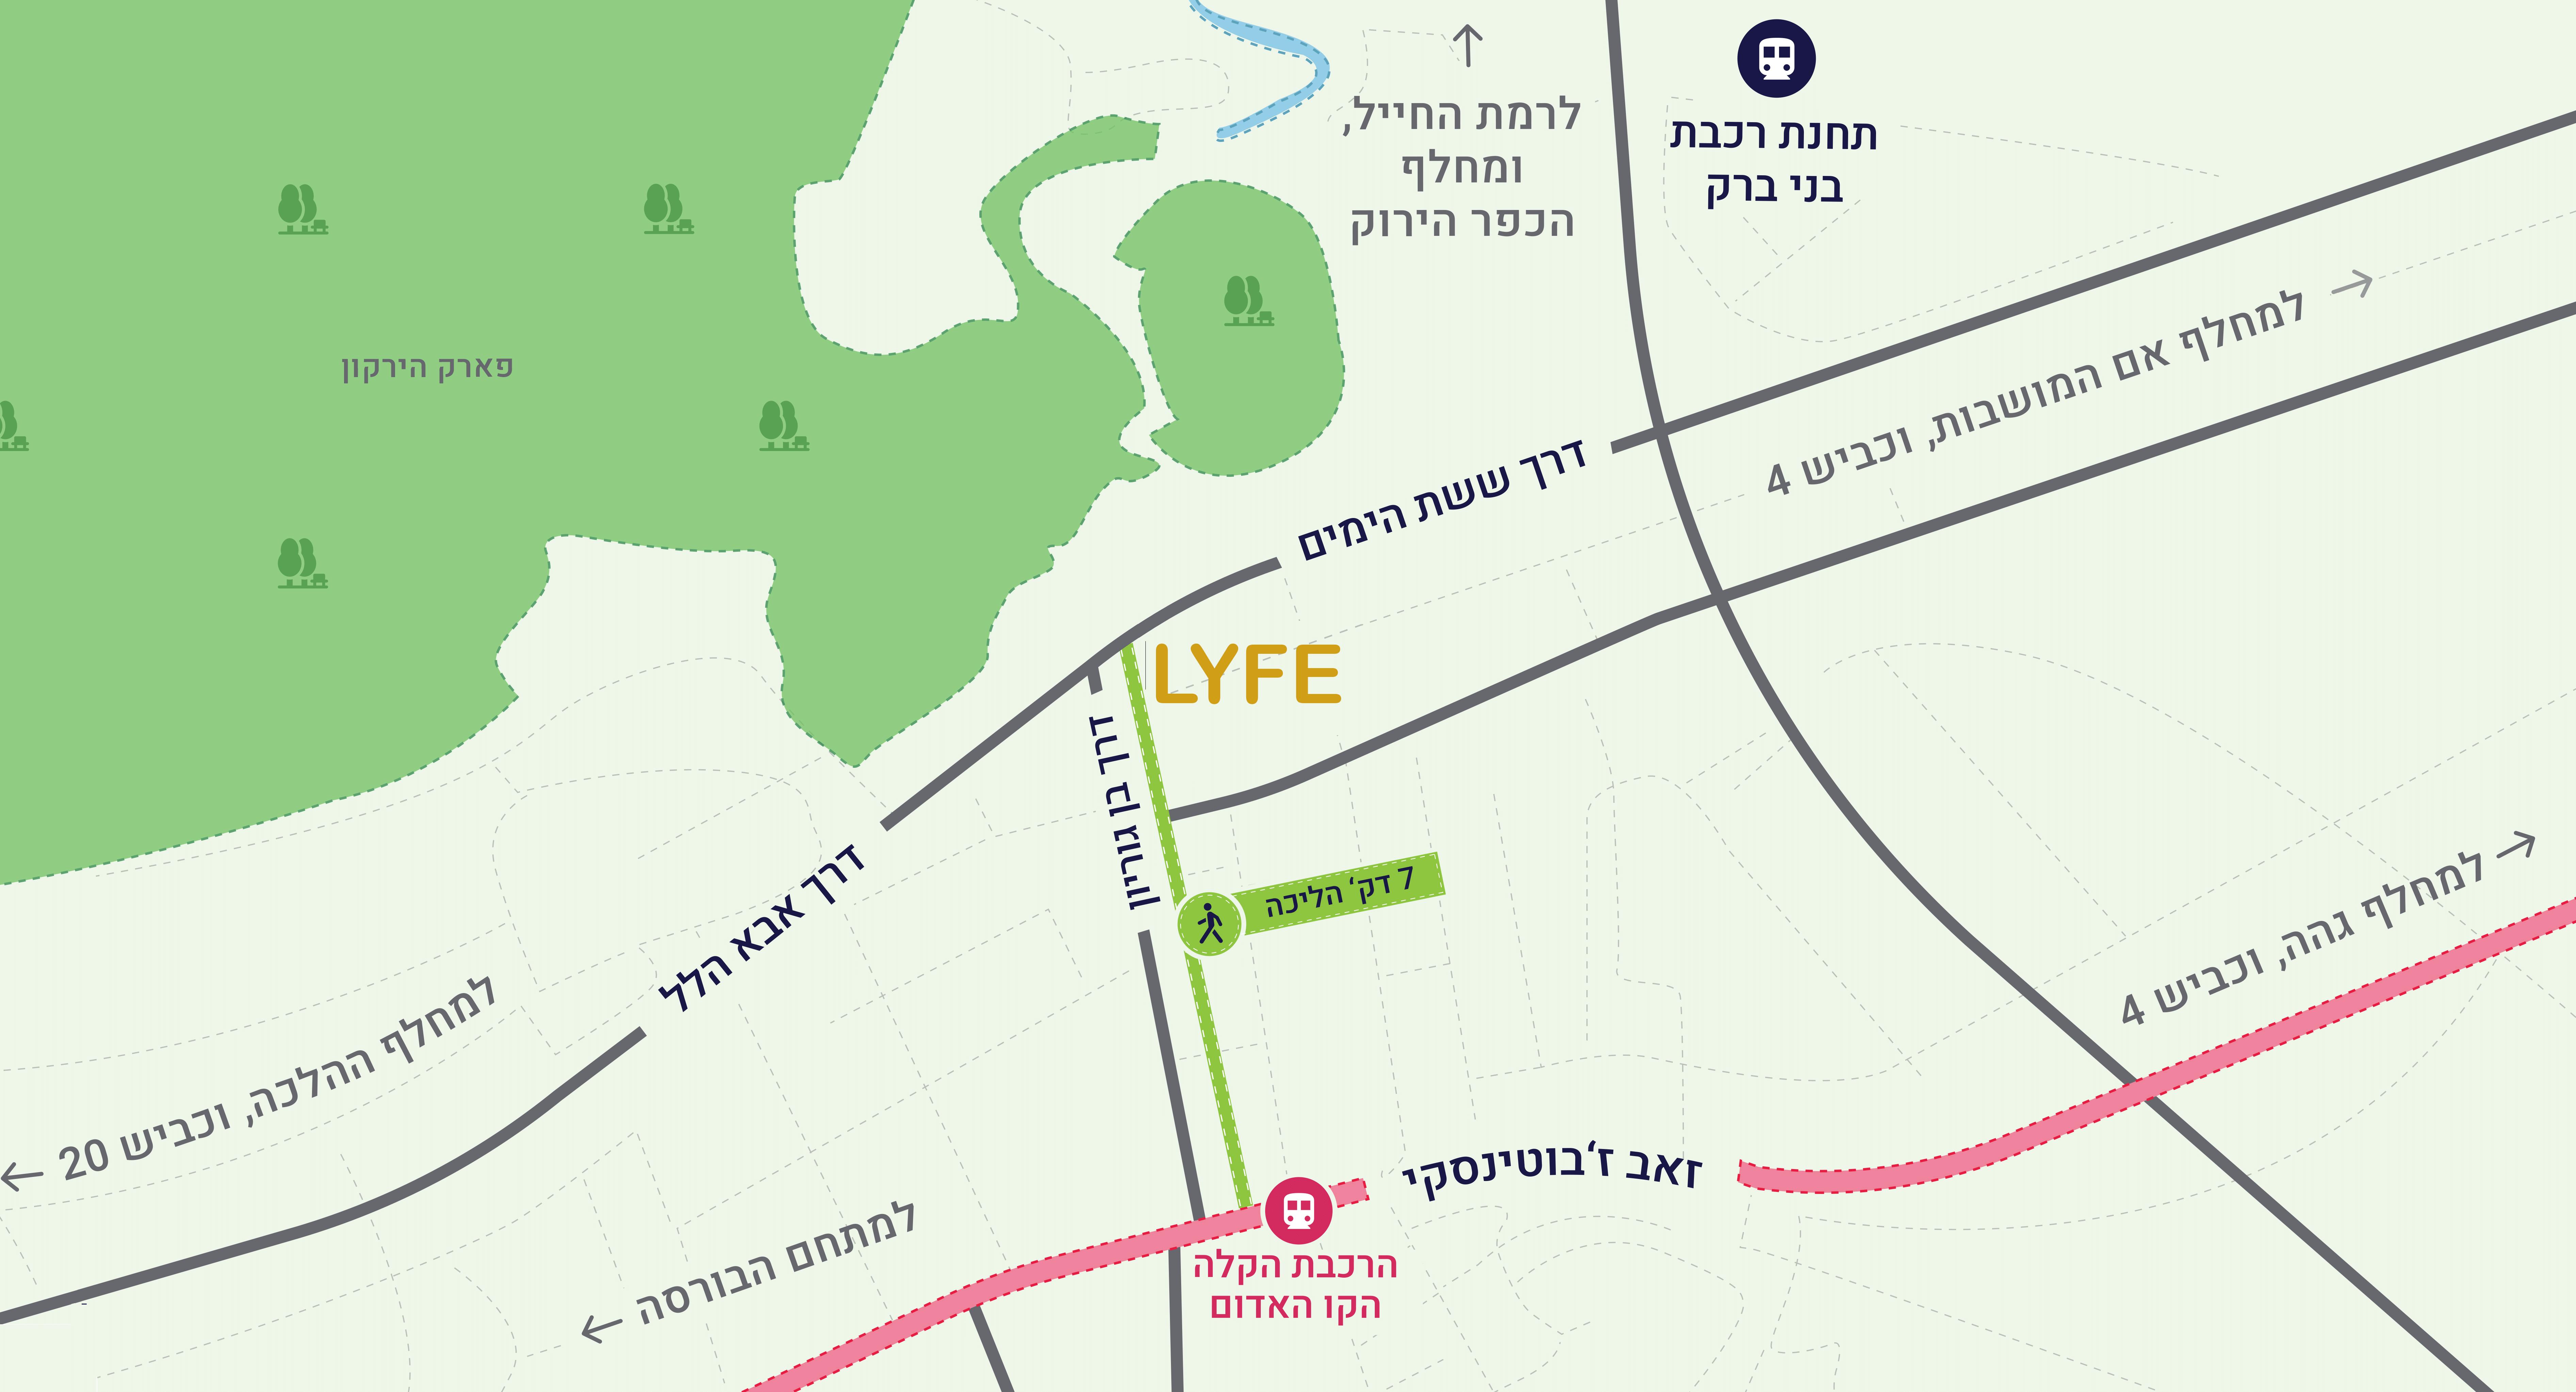 https://lyfetowers.co.il/wp-content/uploads/2021/06/LYFE_map_02_02-1.png